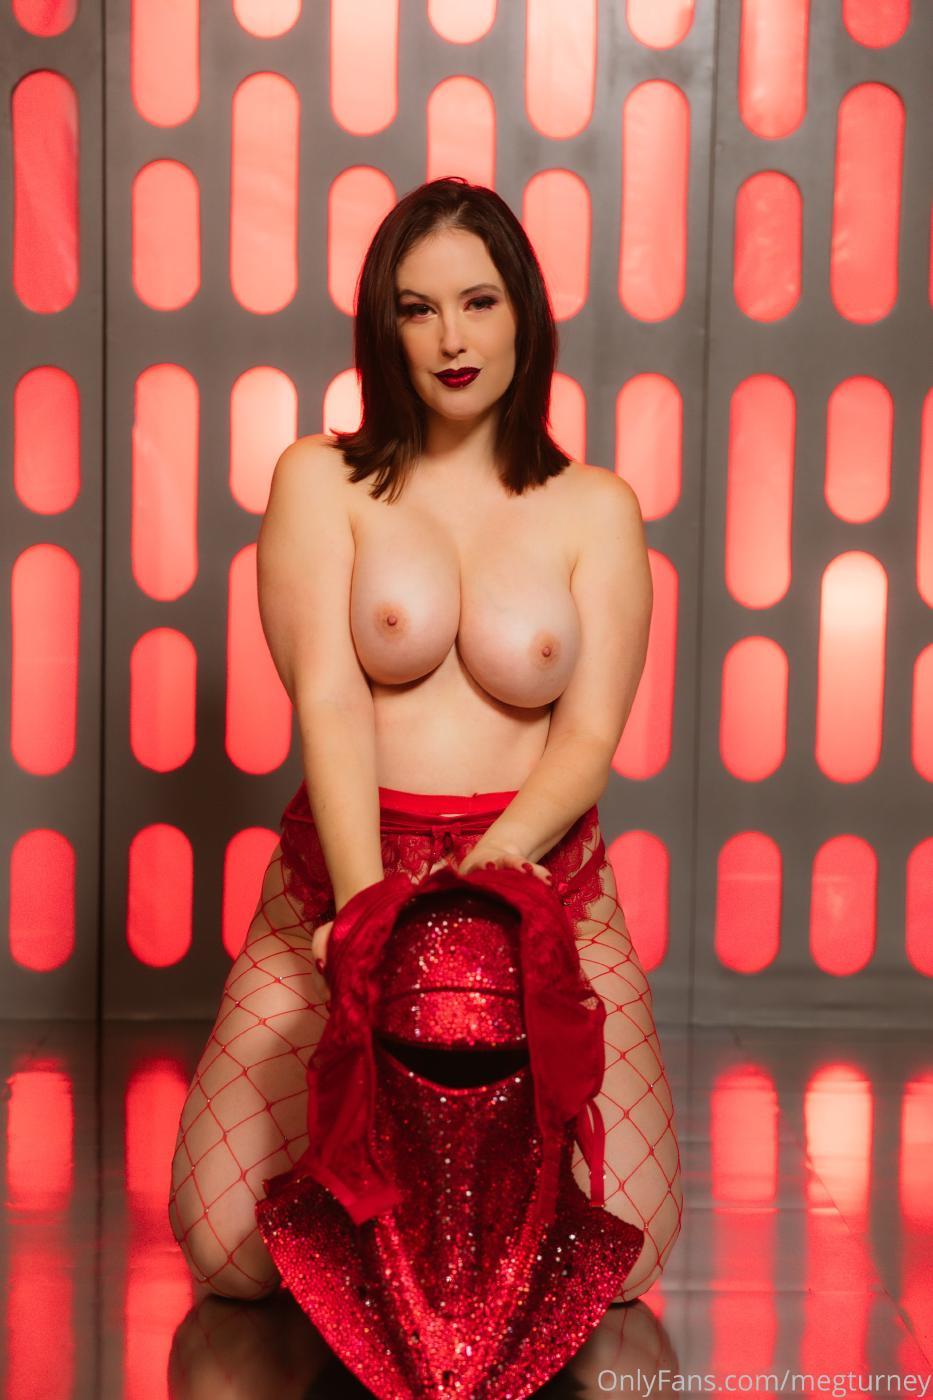 Meg Turney Imperial Guard Topless Cosplay Onlyfans Set Leaked Okbeze